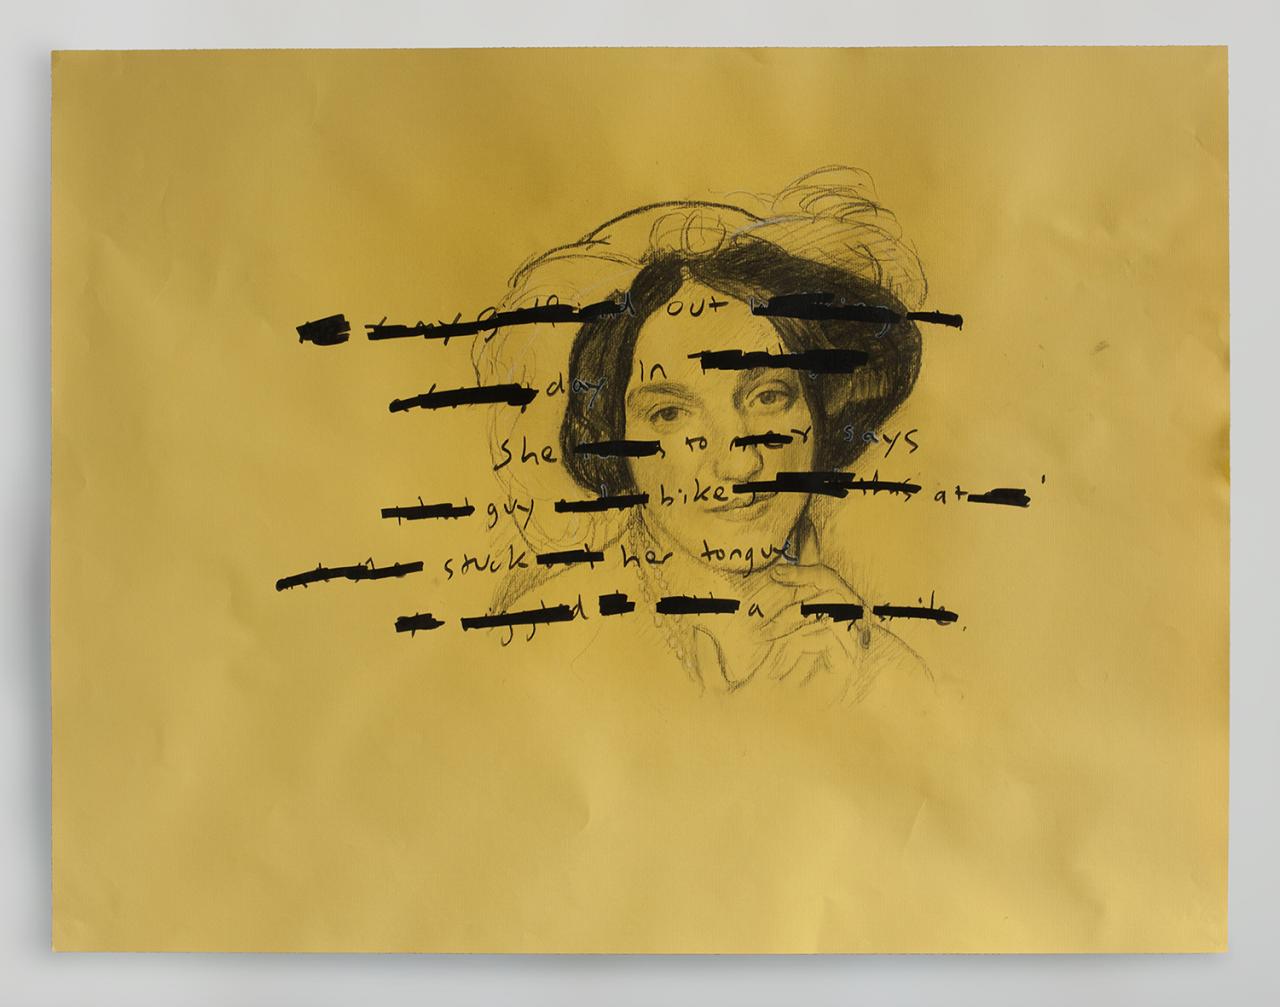 Tongue 2018 - 50 x 65cm, charcoal, pen on Ingres paper